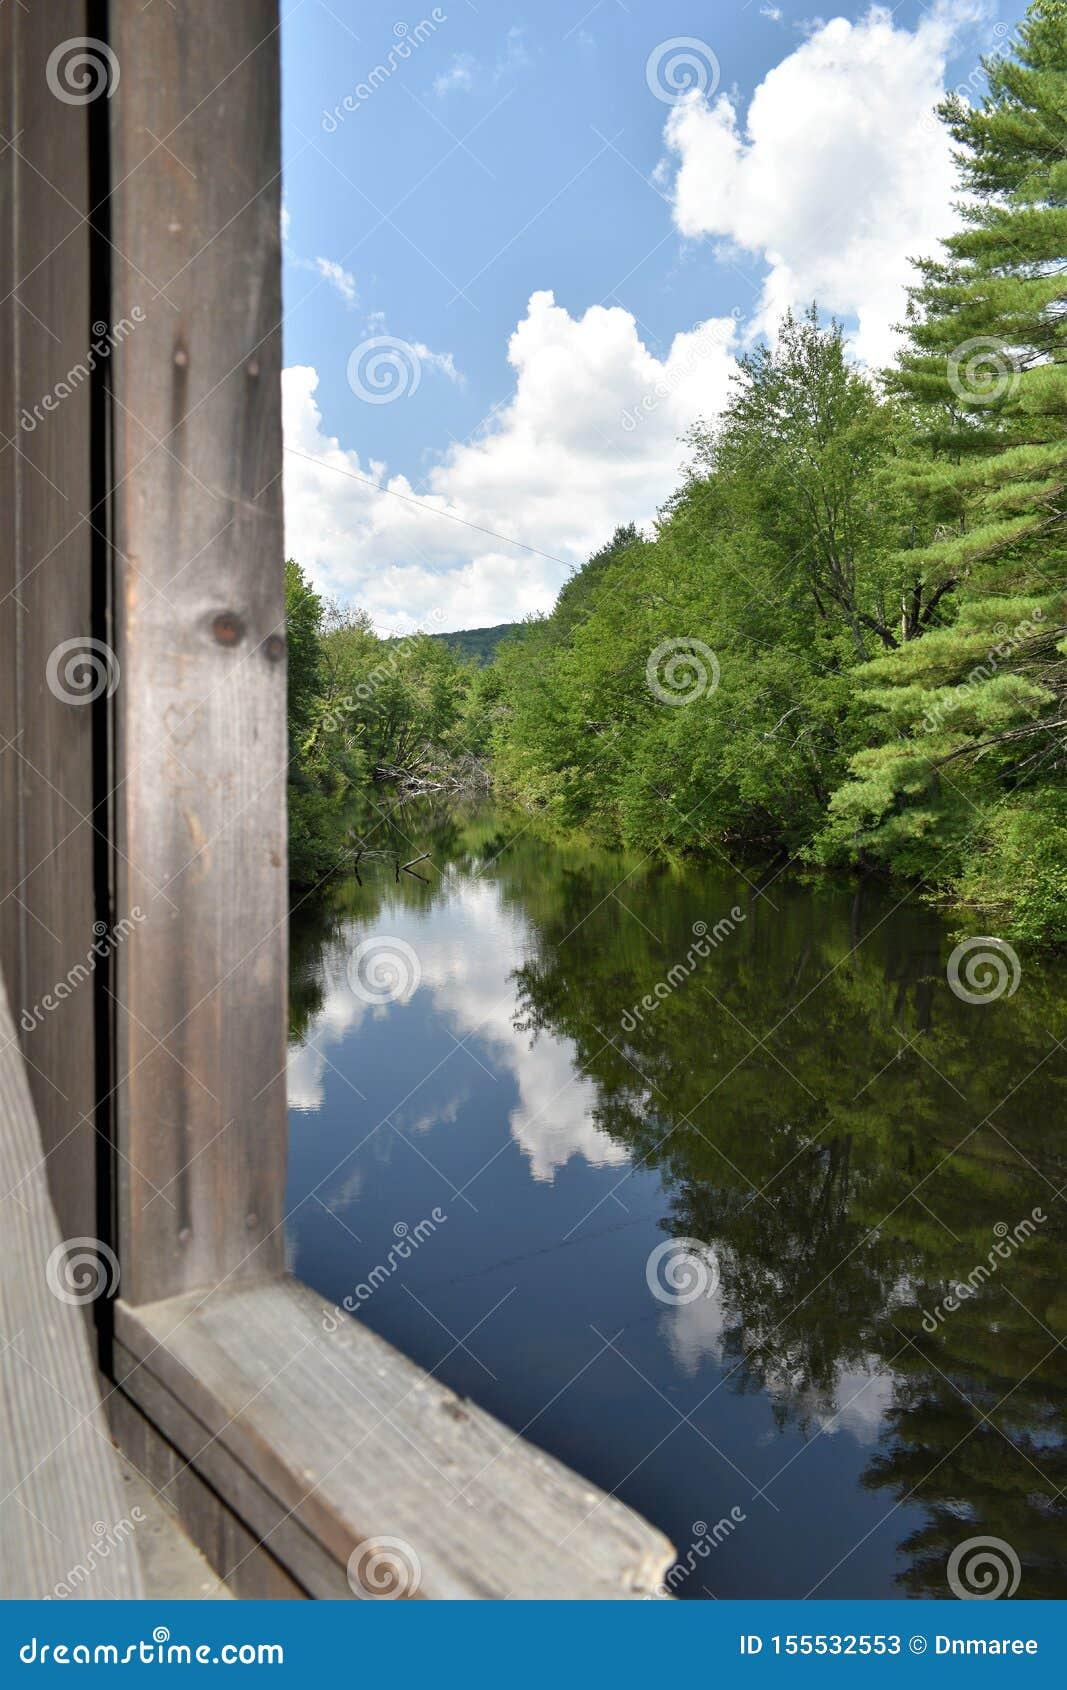 Waterloo cobriu a ponte, cidade de Warner, Merrimack County, New Hampshire, Estados Unidos, Nova Inglaterra